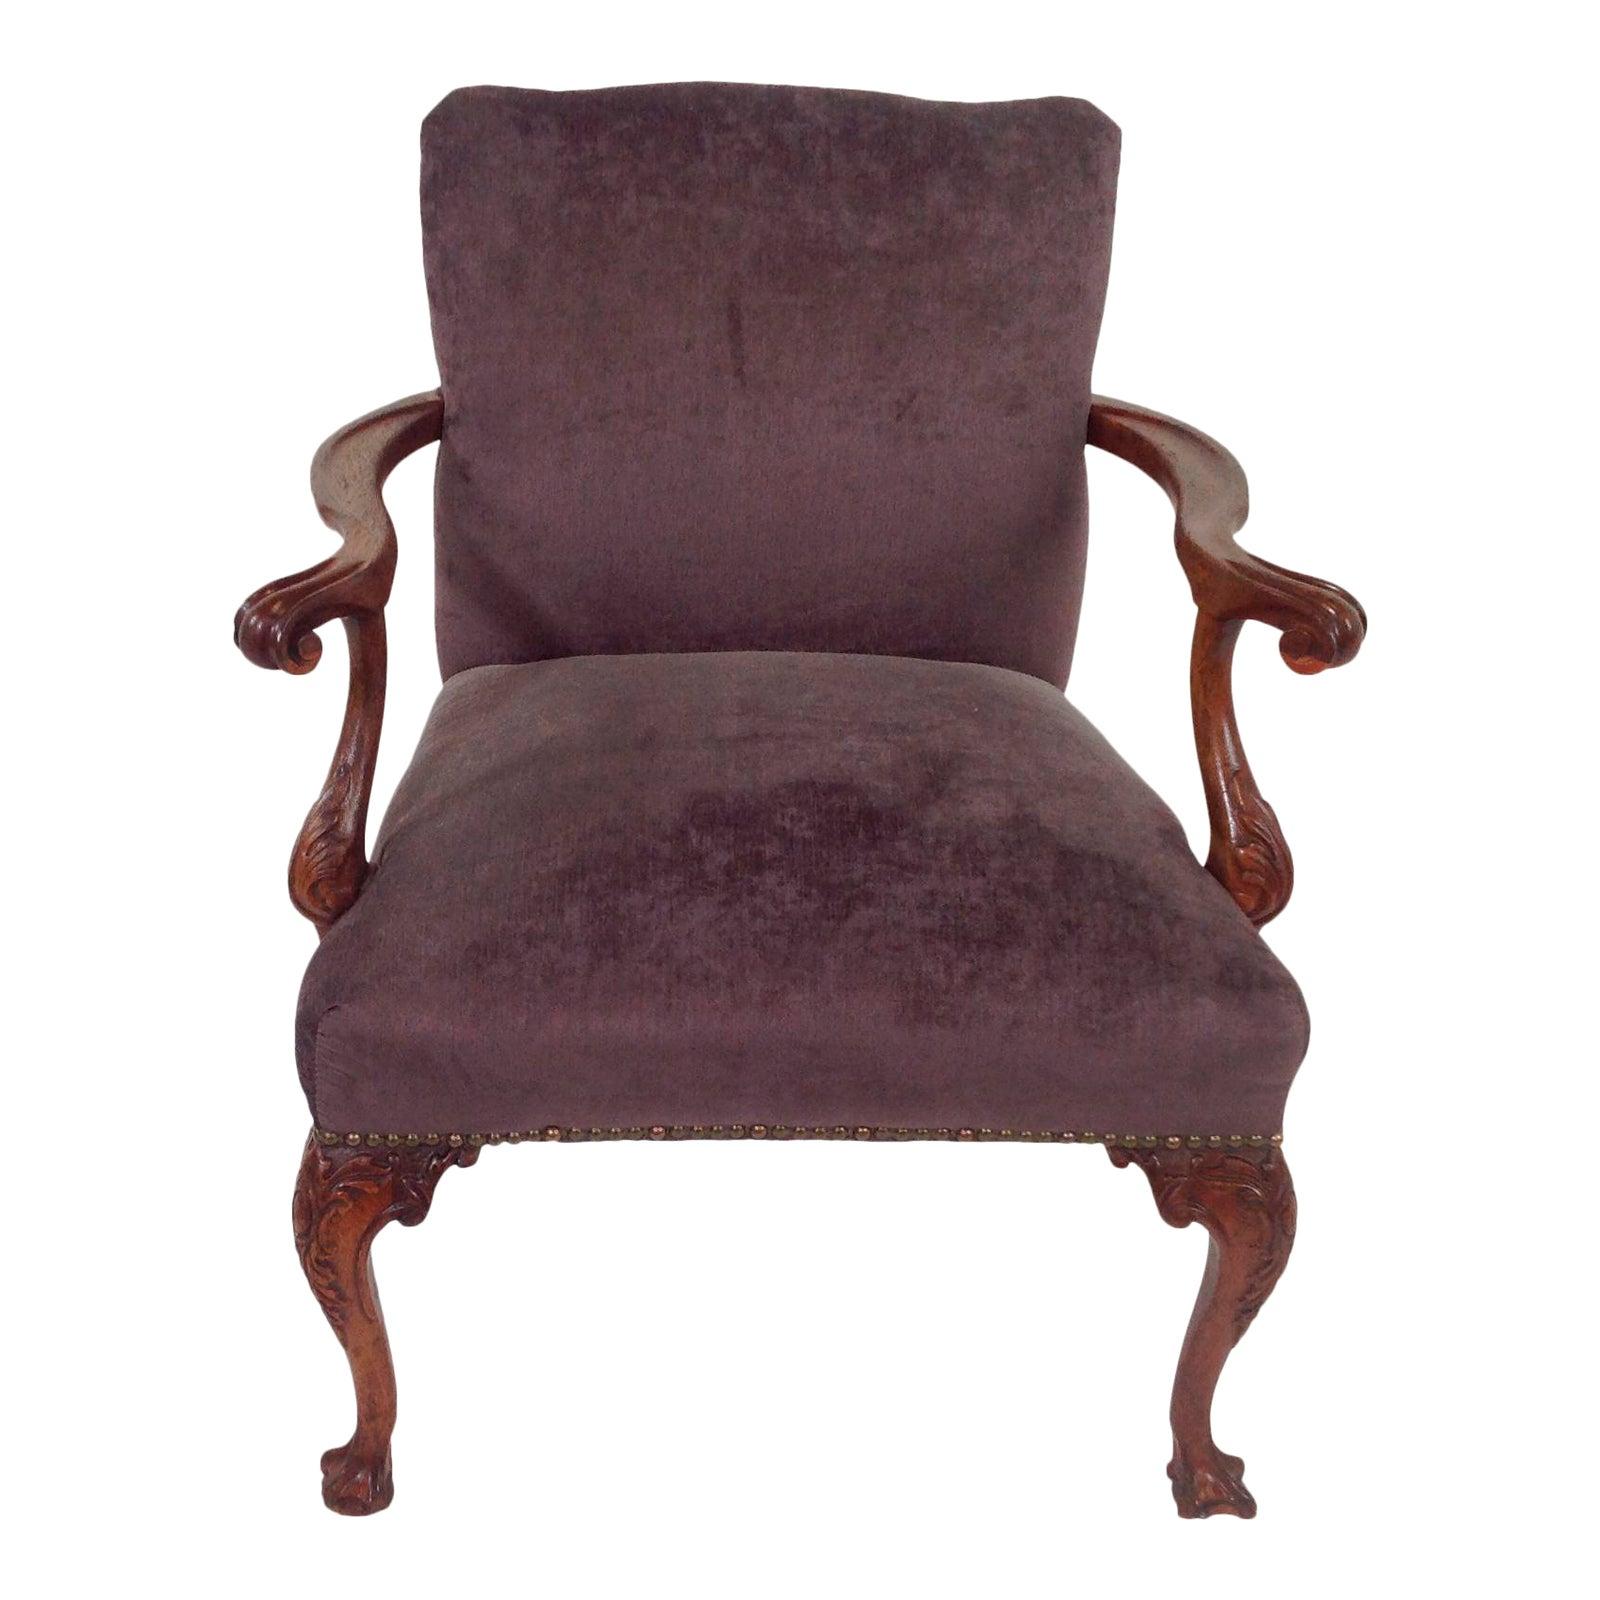 Antique purple velvet claw foot chair chairish